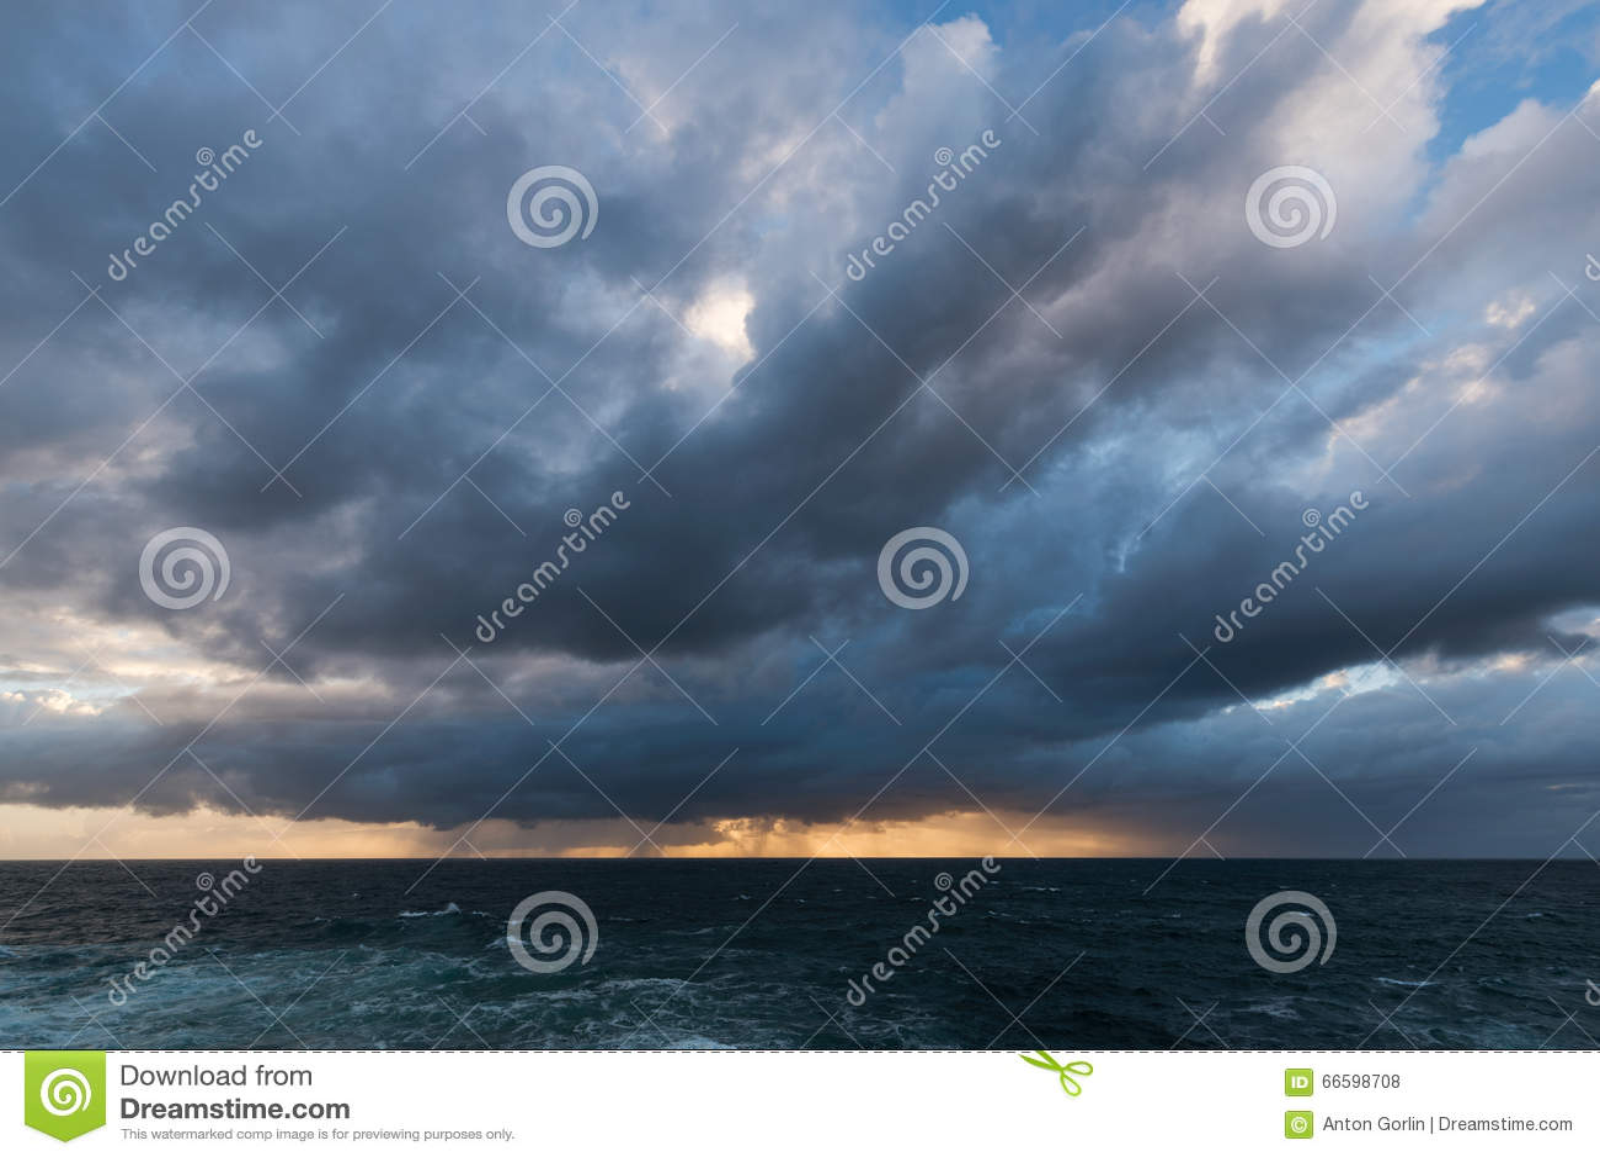 Причаливая облака шторма